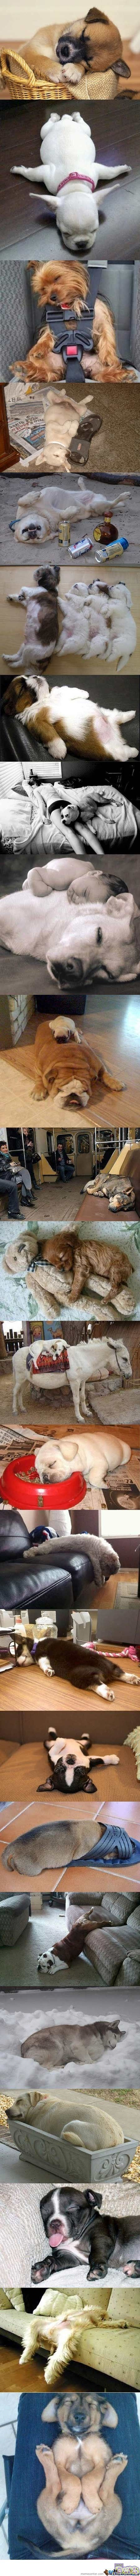 Puppies Sleep Attack